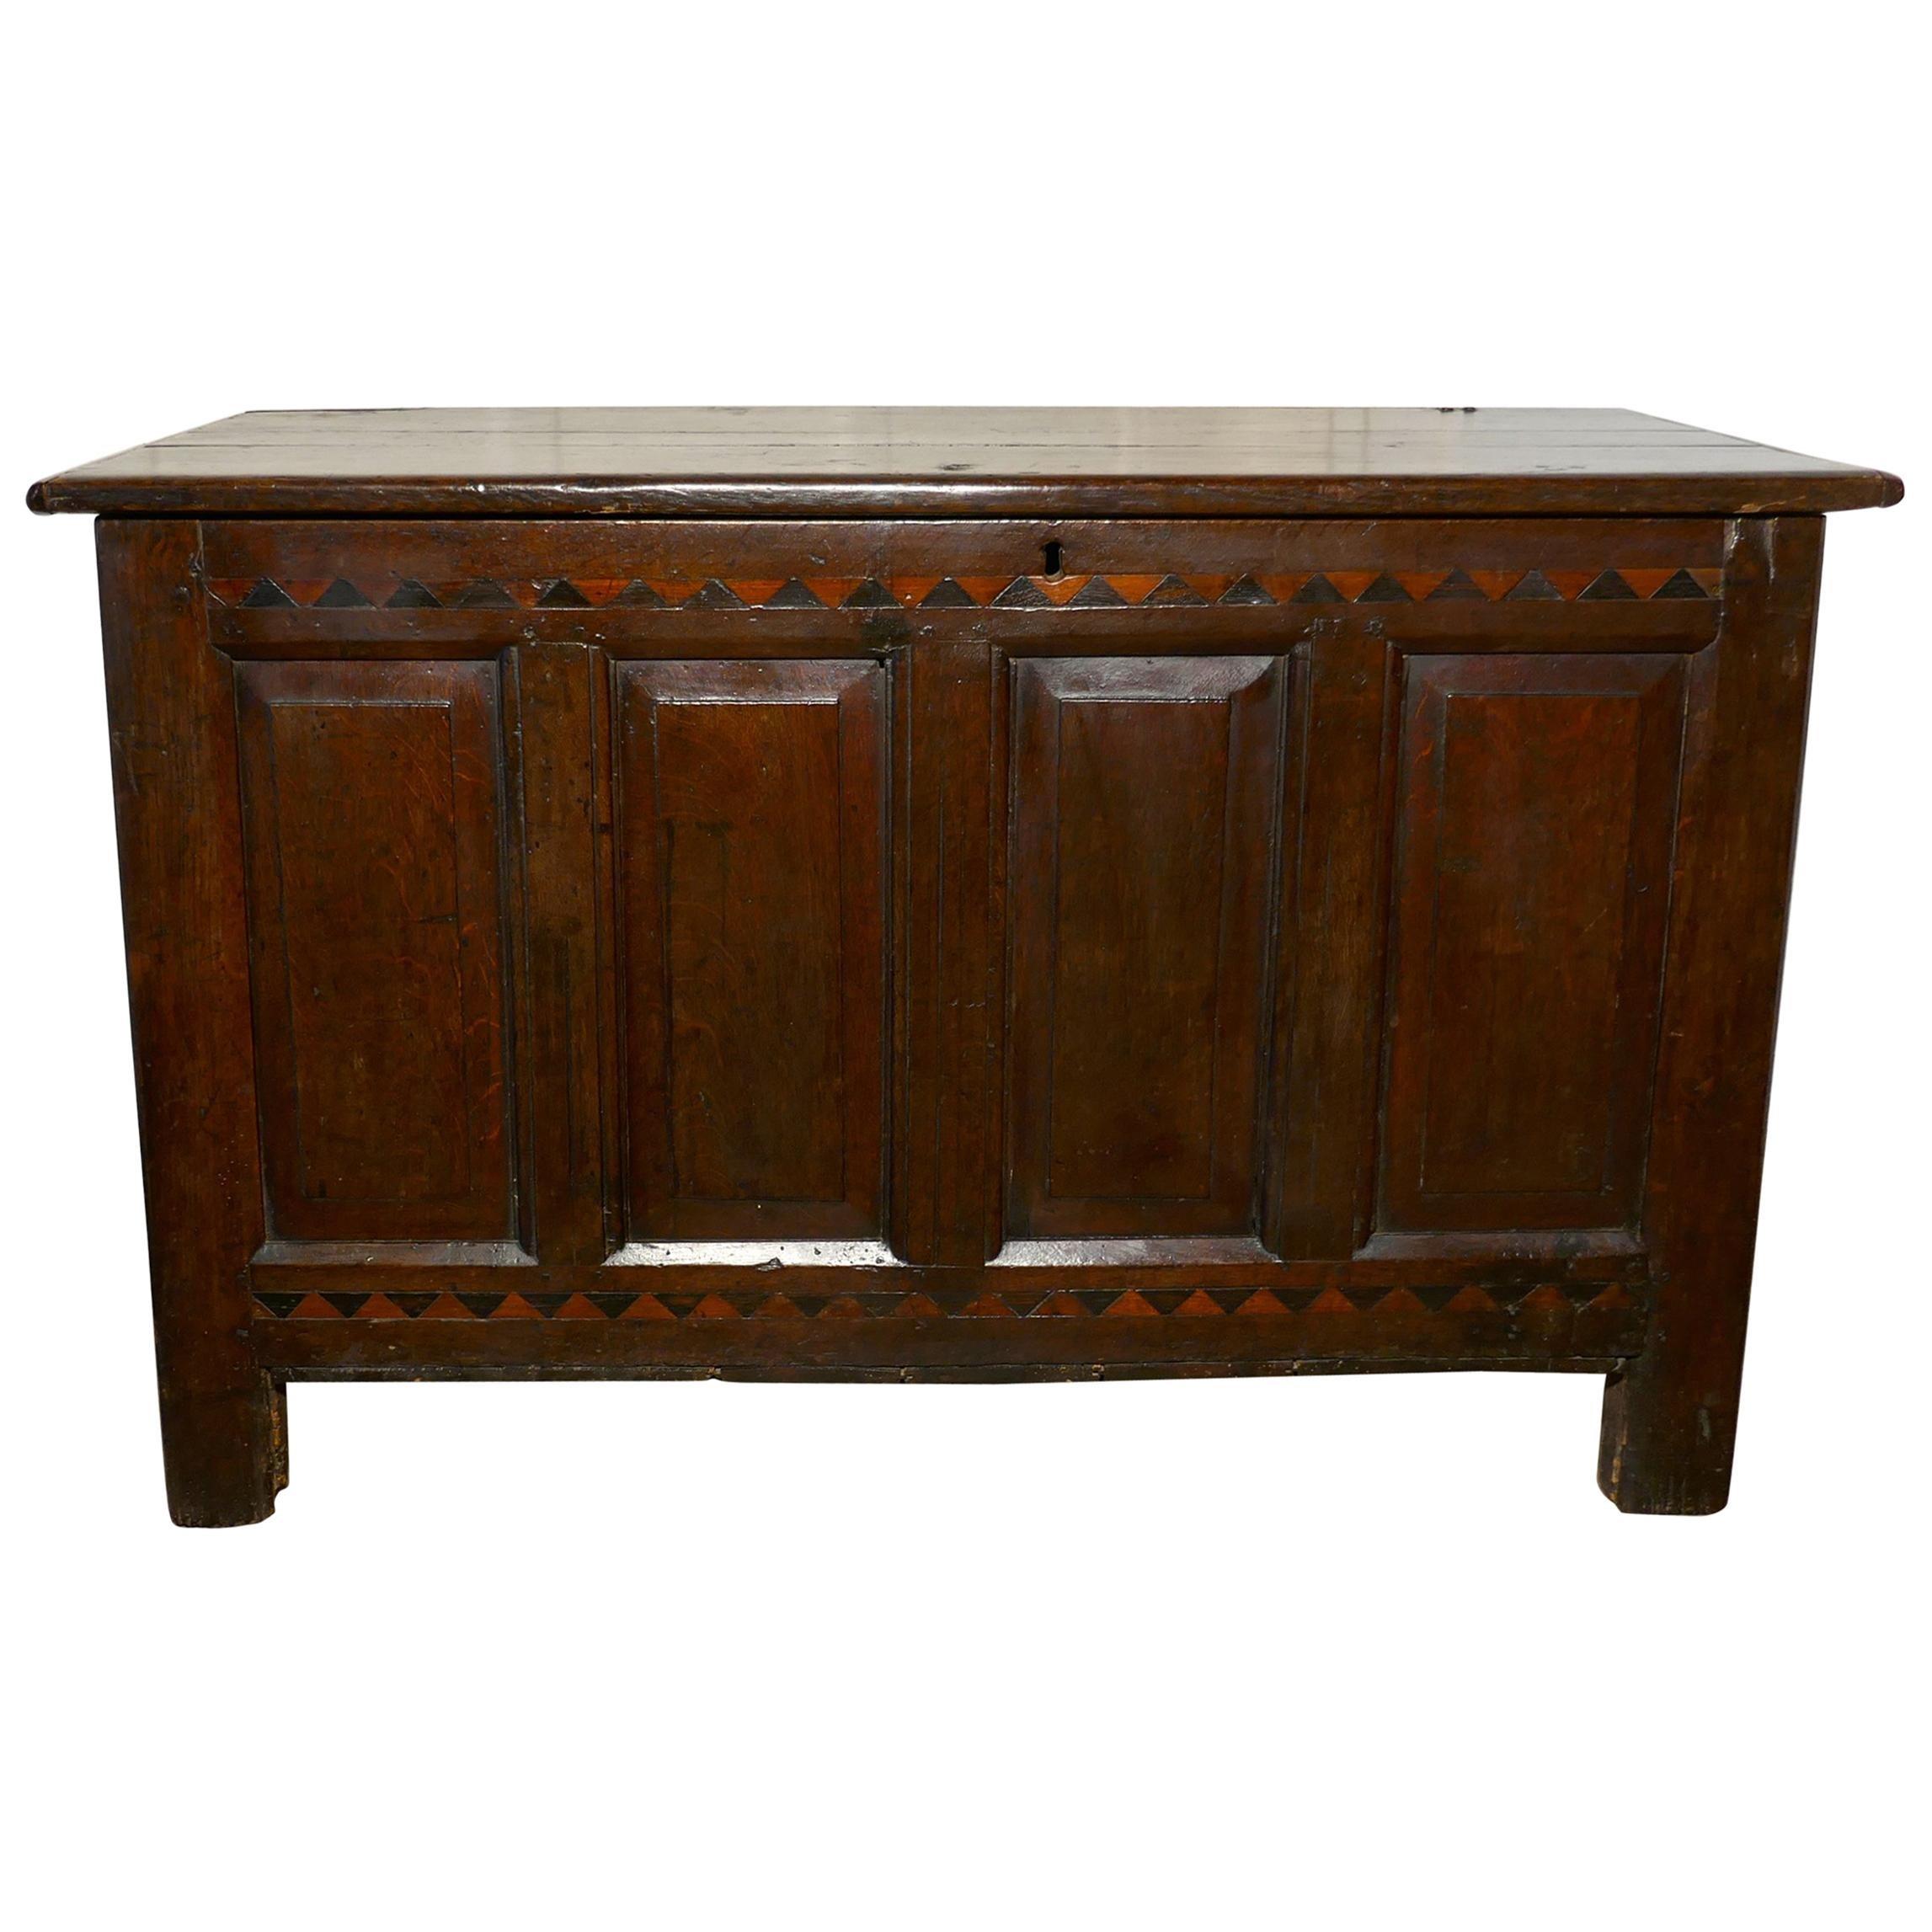 Large 17th Century Inlaid Panelled Oak Coffer